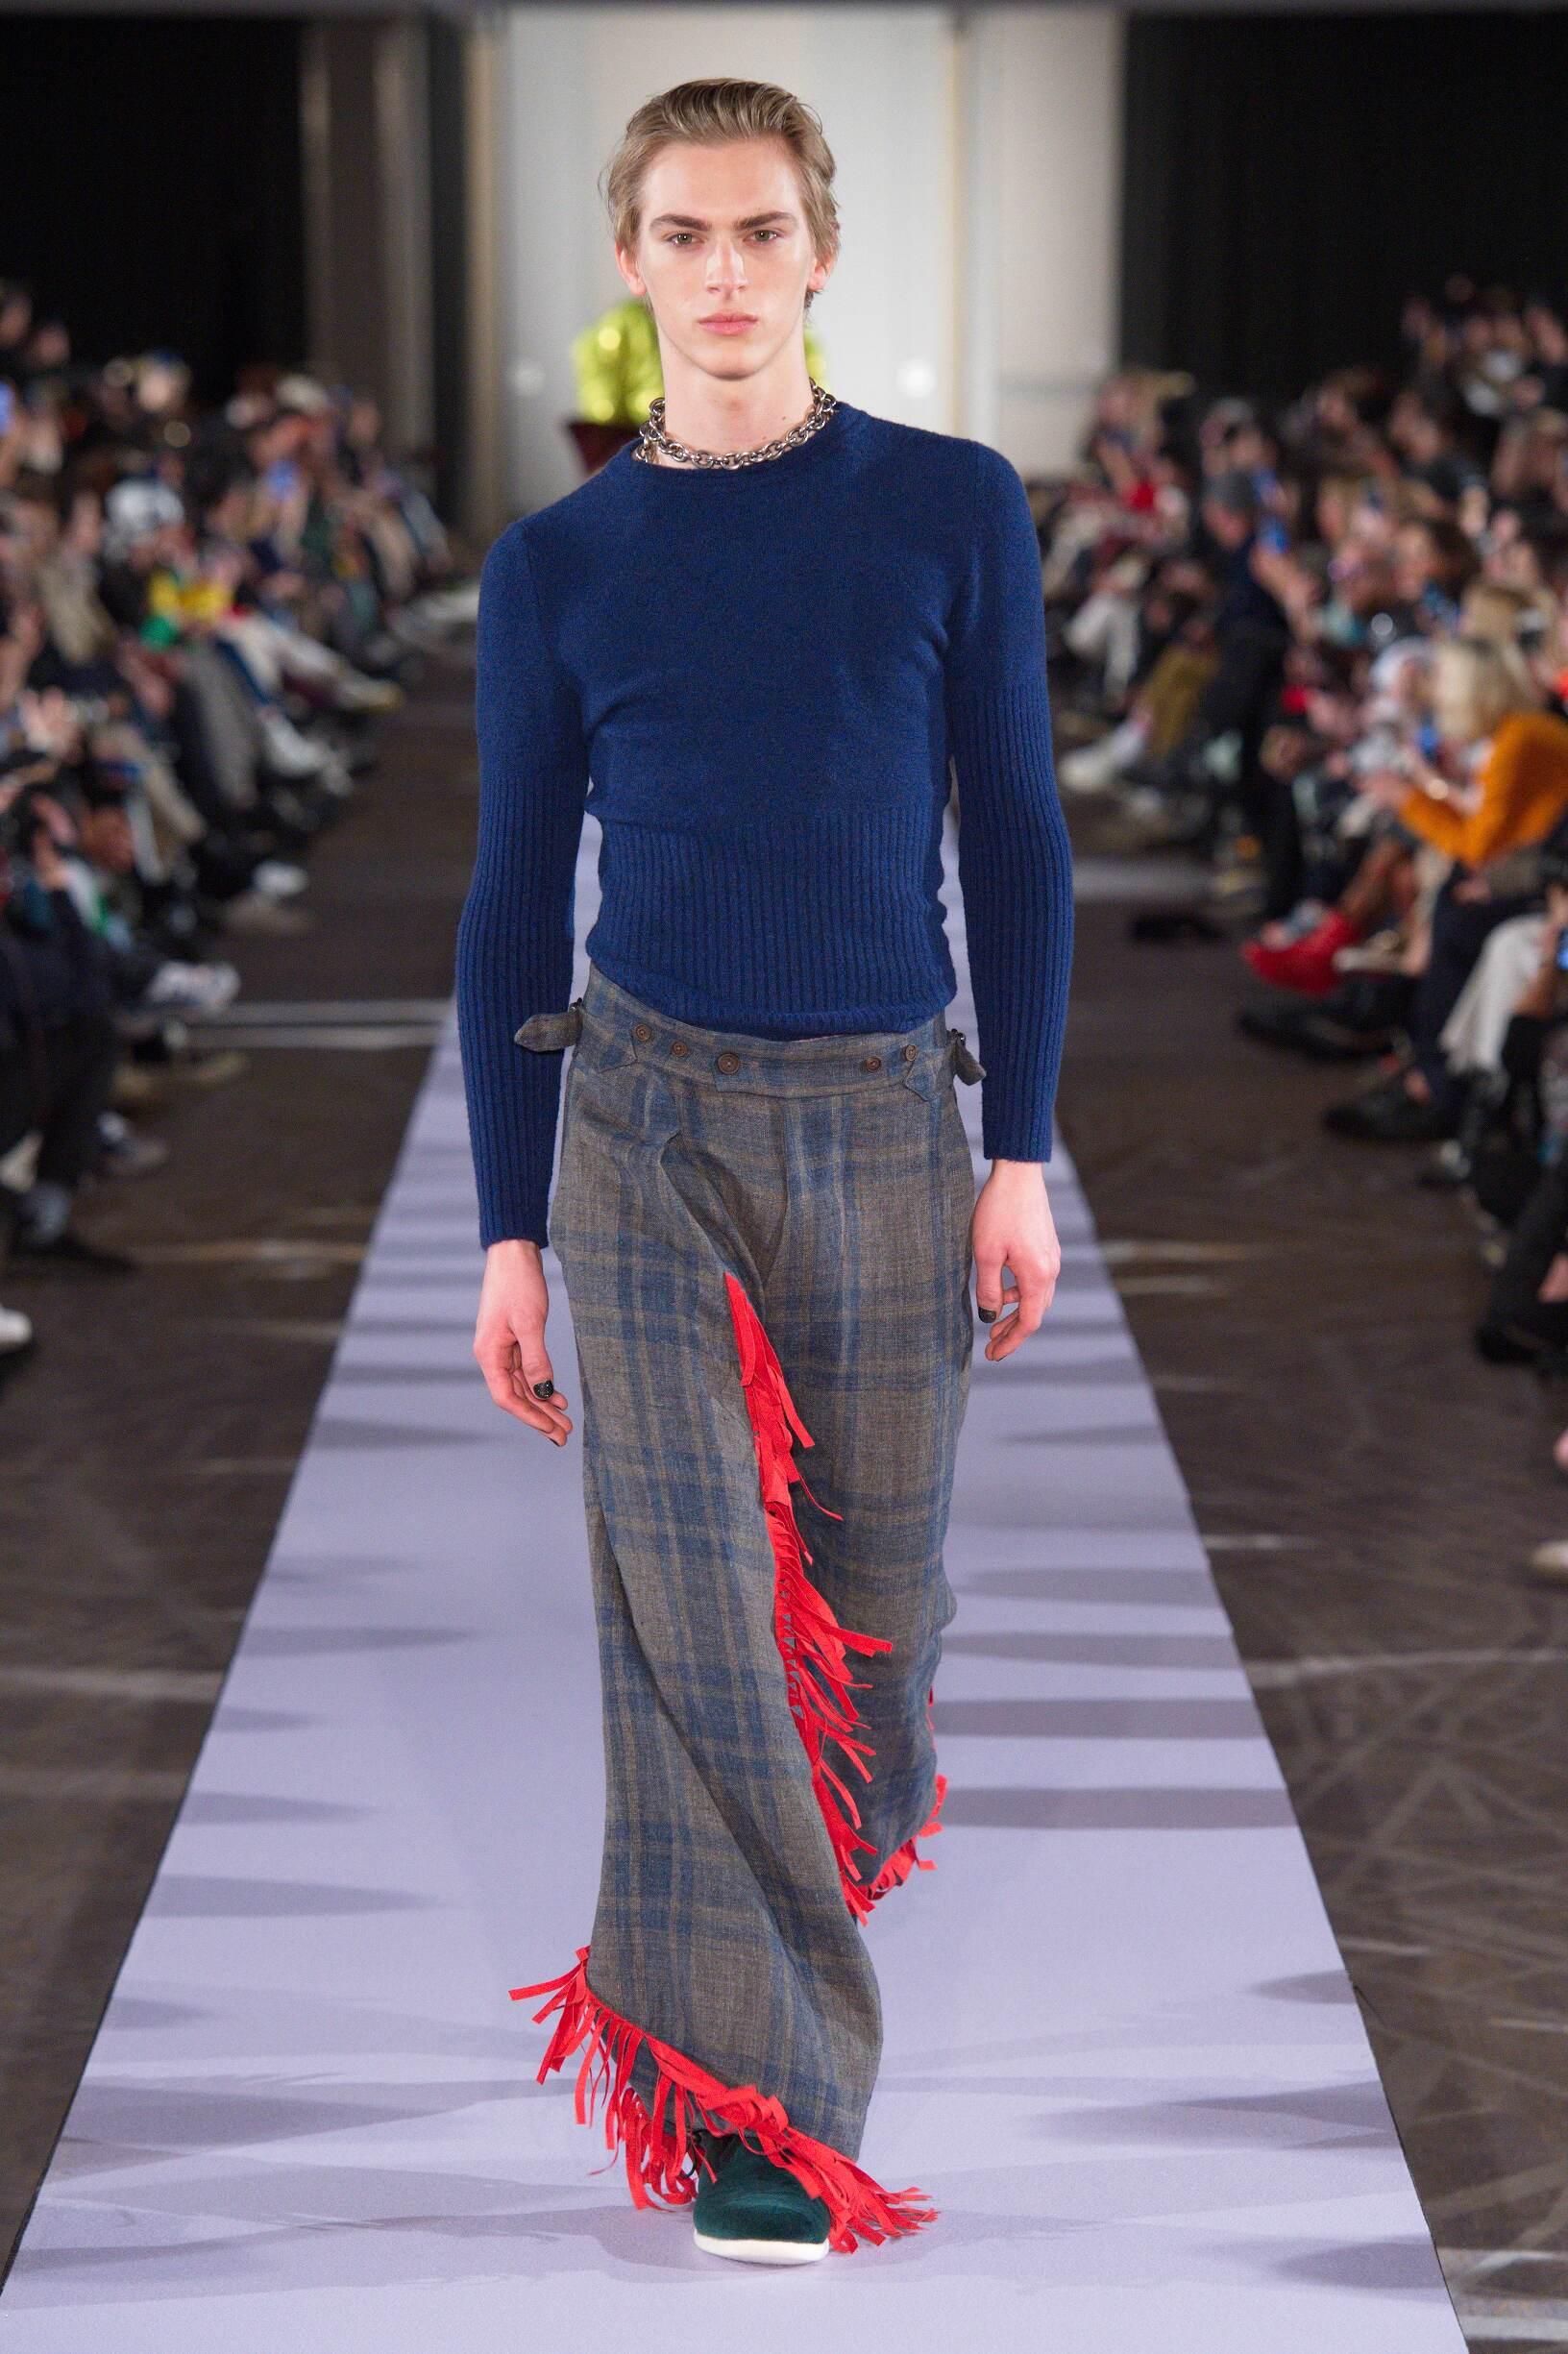 Catwalk Andreas Kronthaler for Vivienne Westwood Men Fashion Show Winter 2019